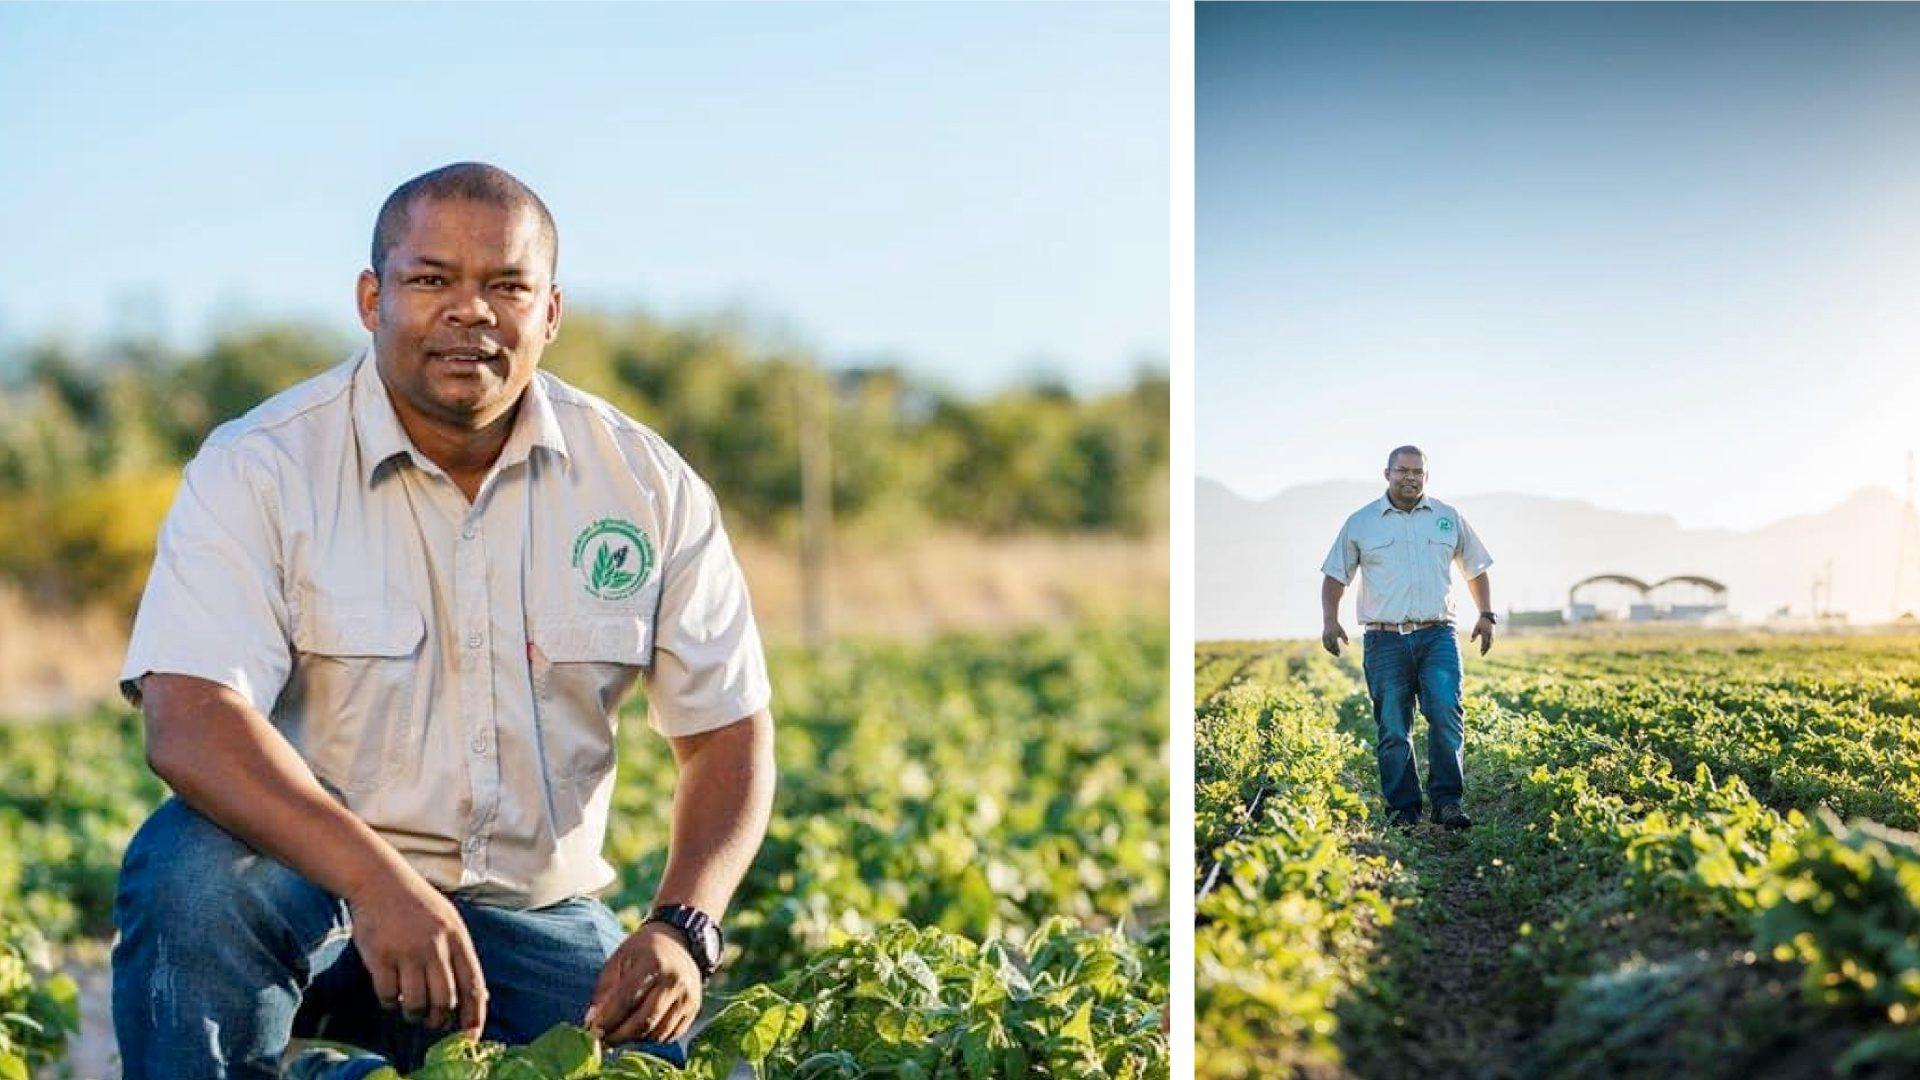 Vegetable farmer Sydney Claassen (40) sacrificed a lot to pursue a career in agriculture. Today he runs a successful 7-hectare farm in Stellenbosch, Western Cape. Photo: Sydney Claassen Facebook.